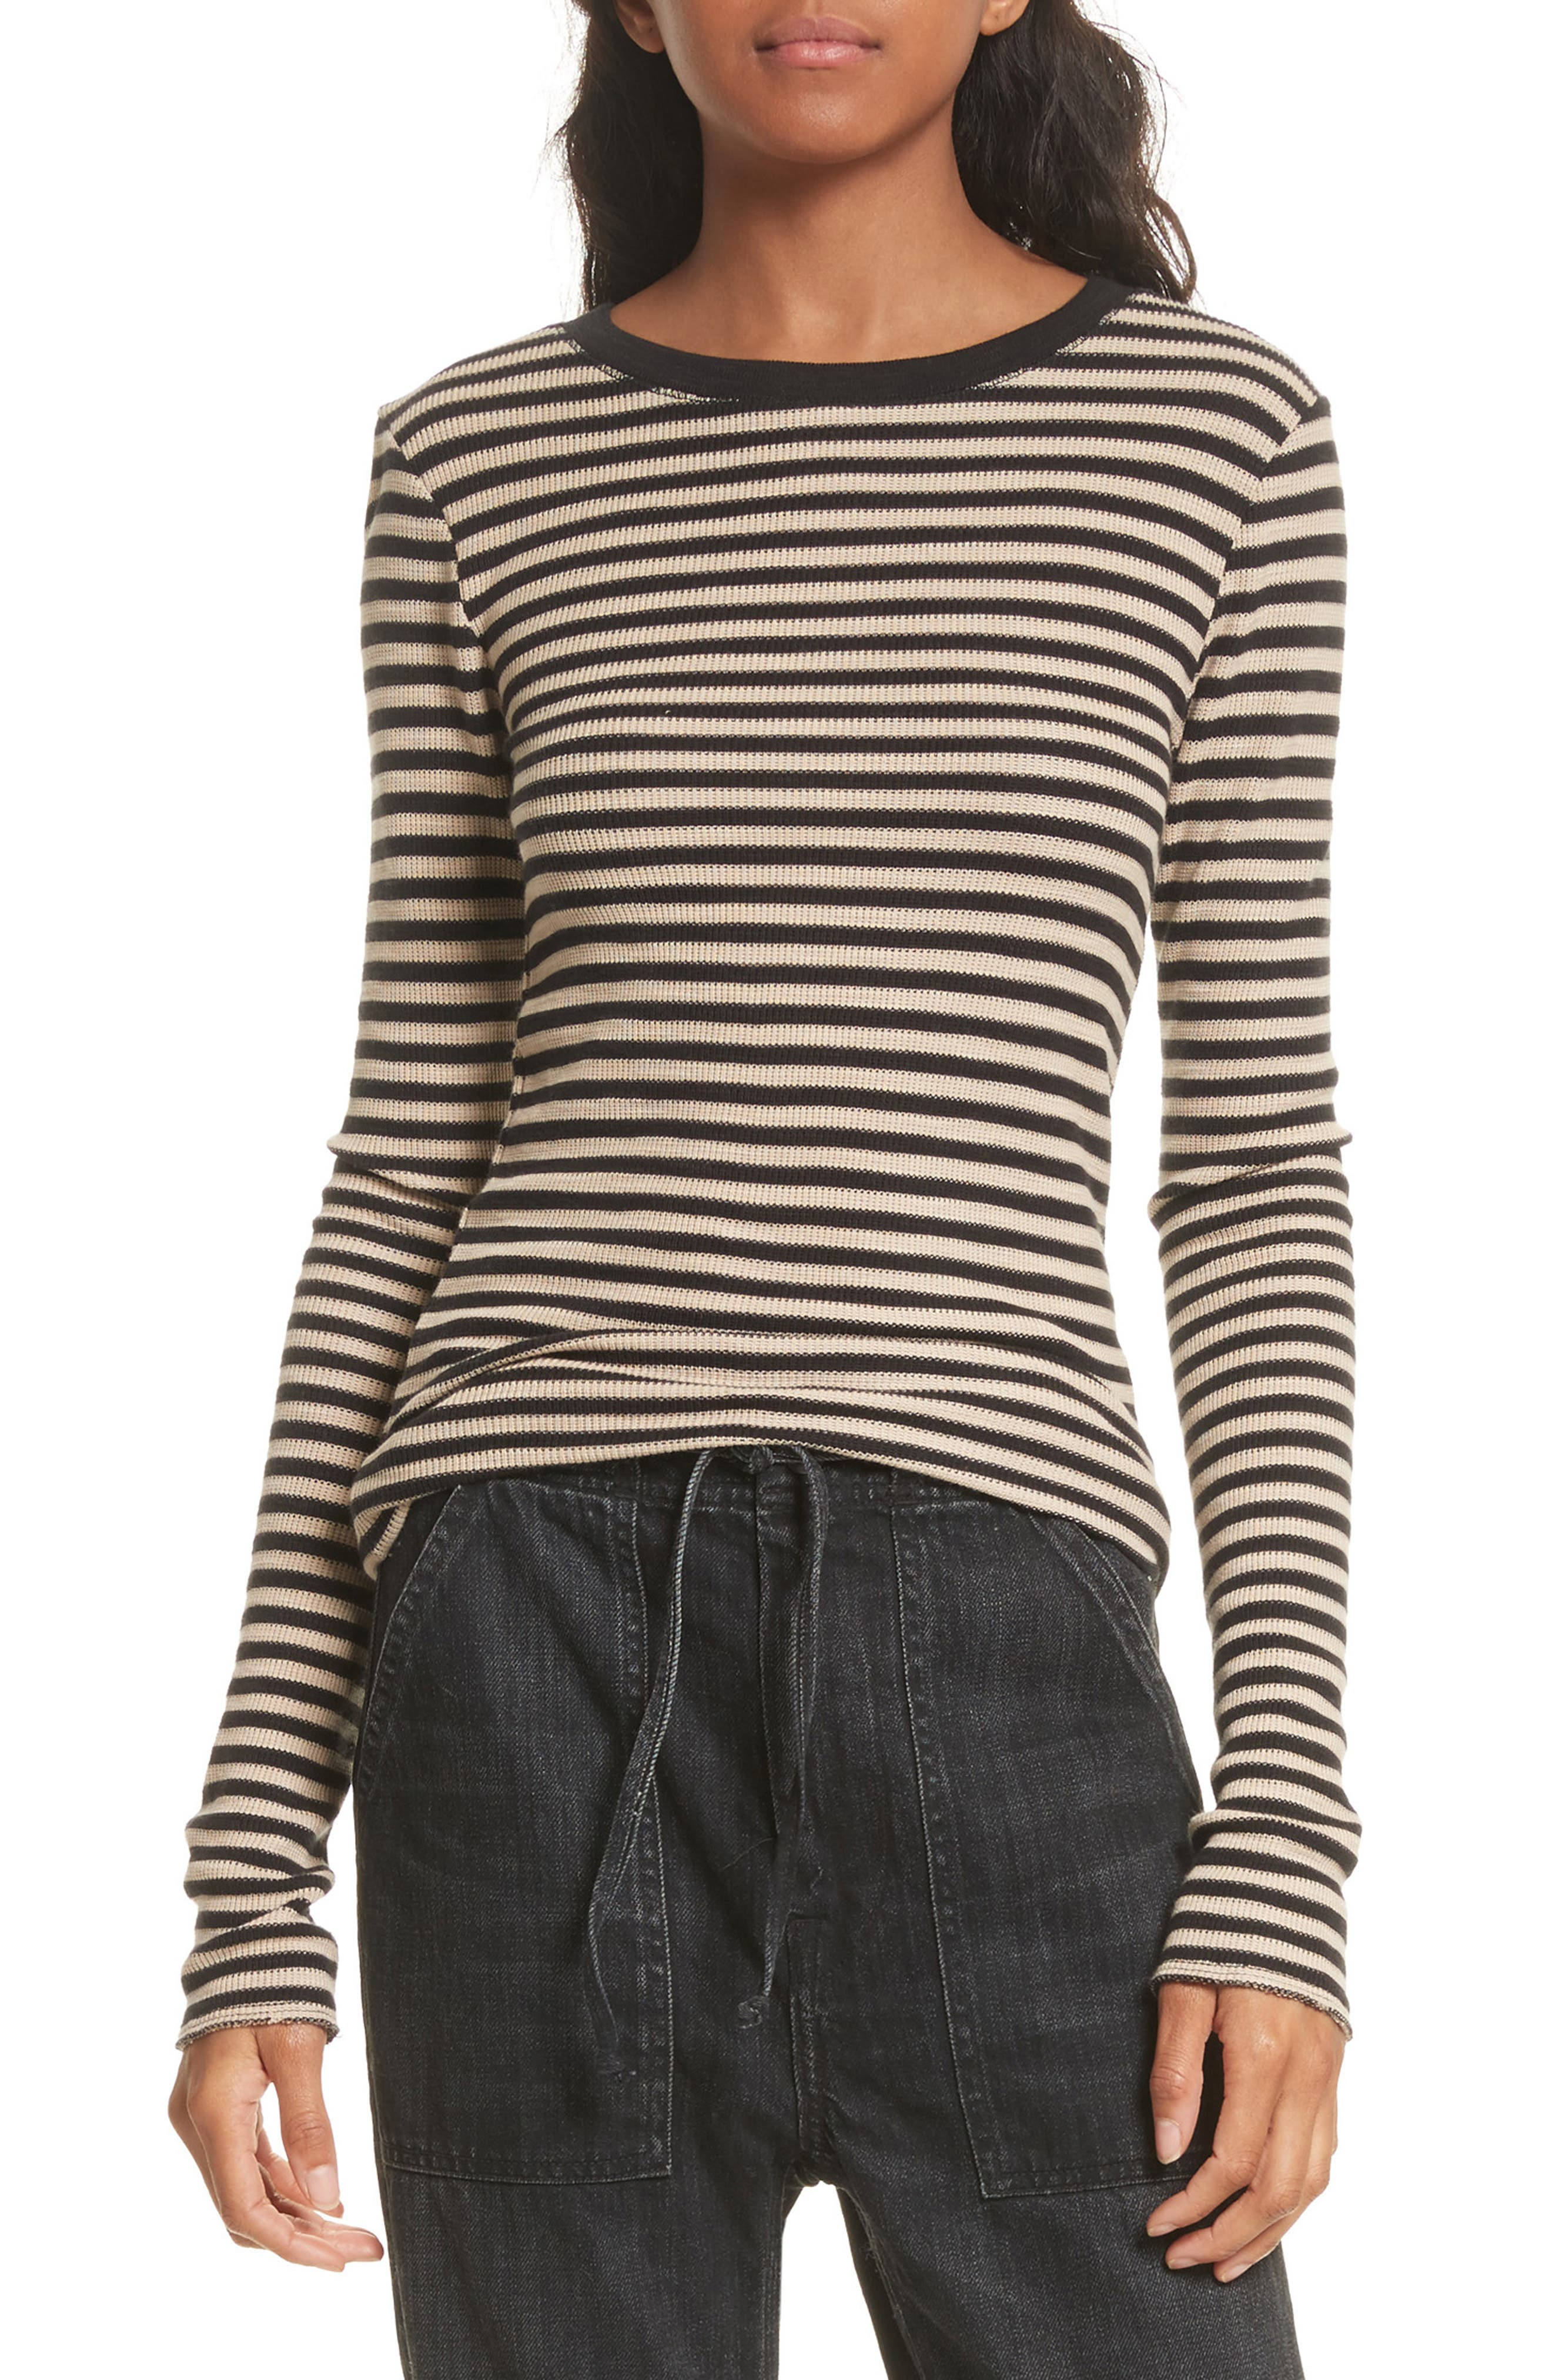 Alternate Image 1 Selected - Vince Railroad Stripe Crewneck Sweater